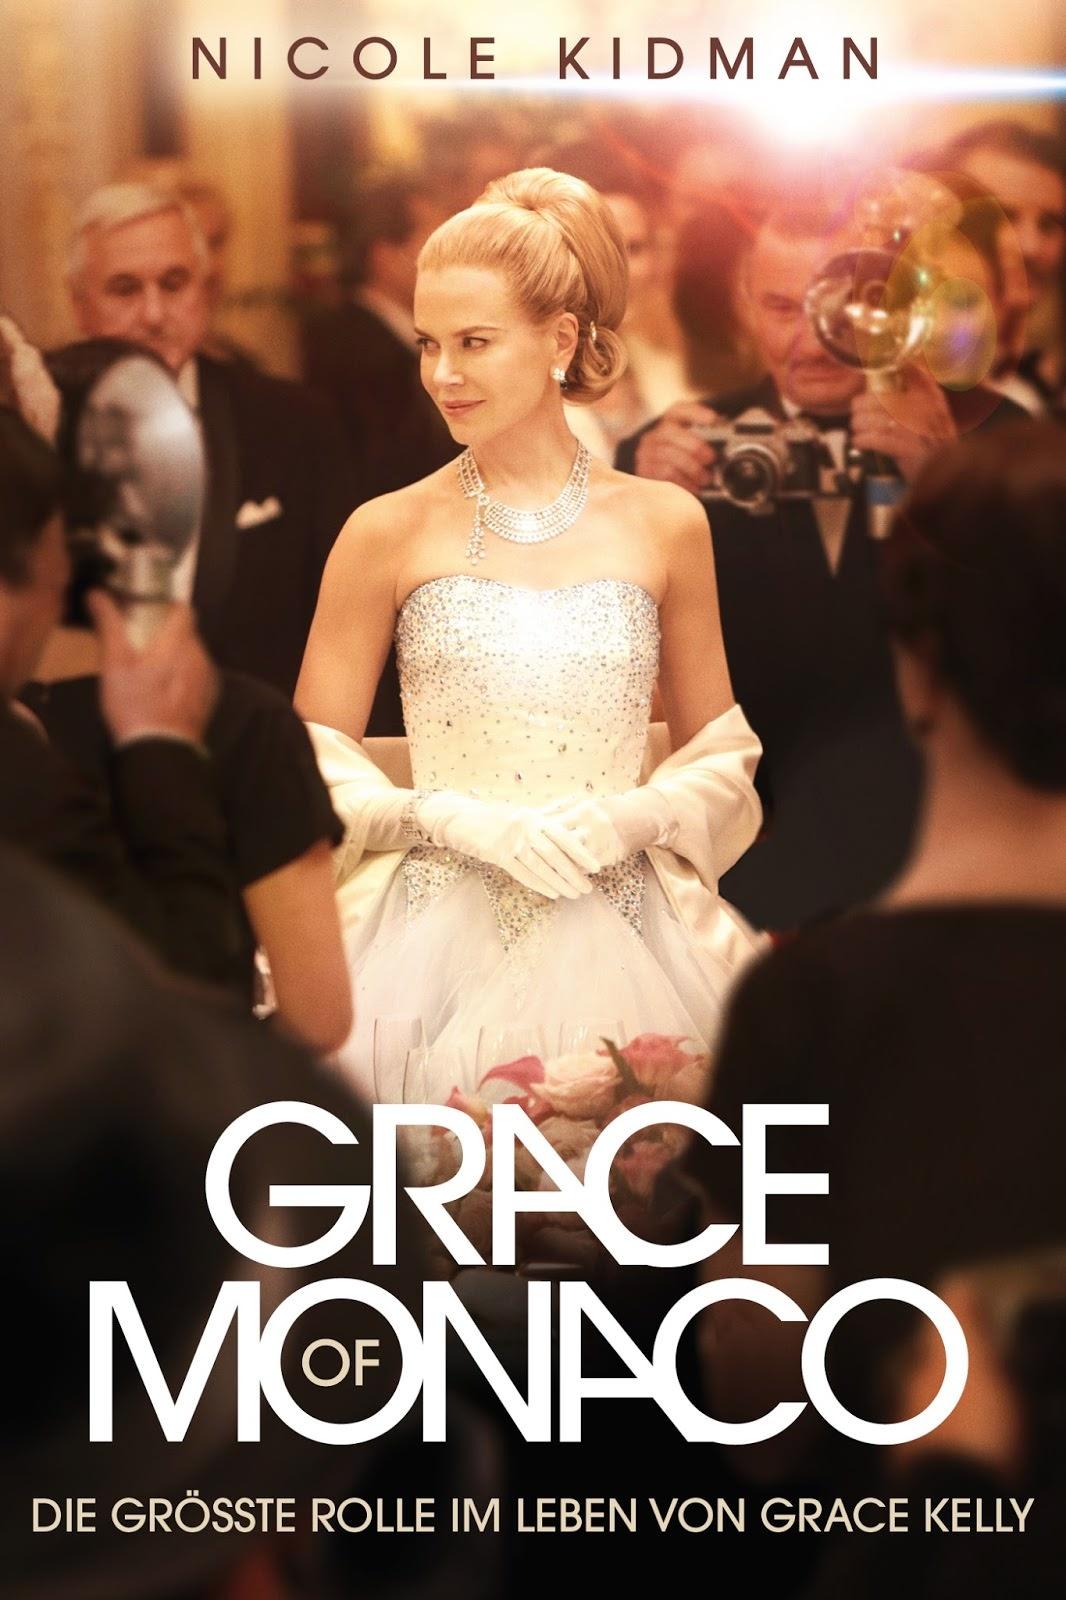 GRACE OF MONACO - เกรซ ออฟ โมนาโก (2014)